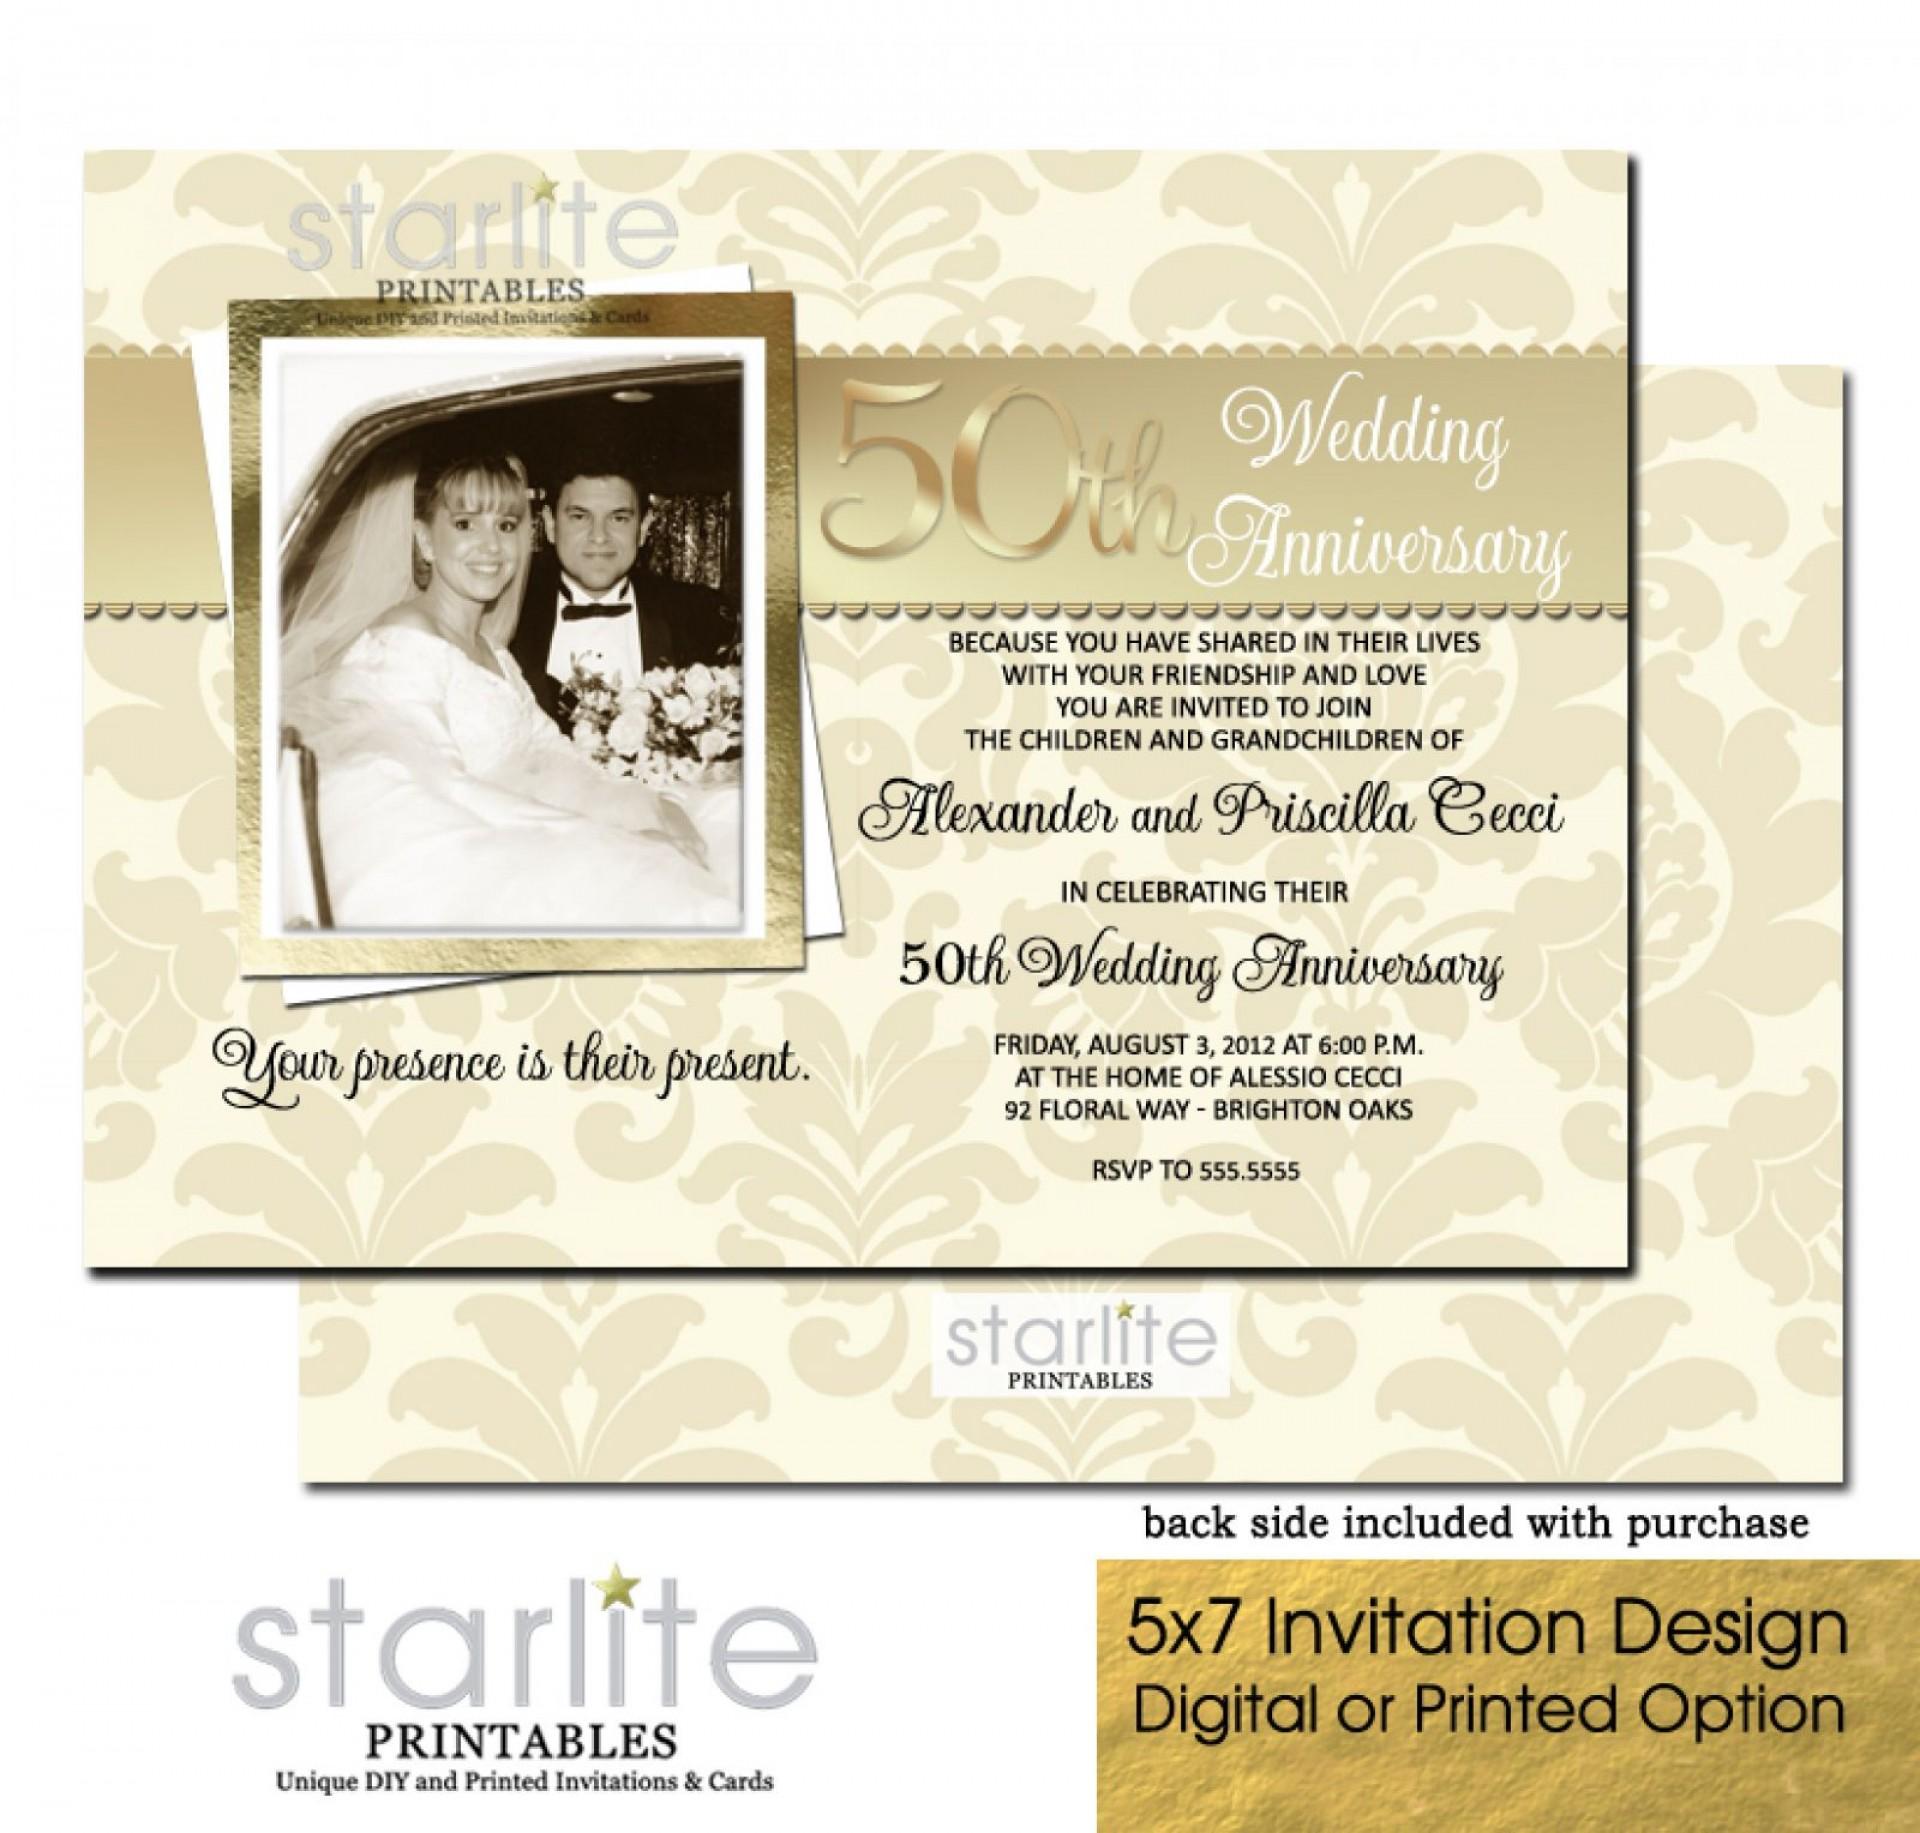 007 Impressive 50th Wedding Anniversary Invitation Design Example  Designs Wording Sample Card Template Free Download1920